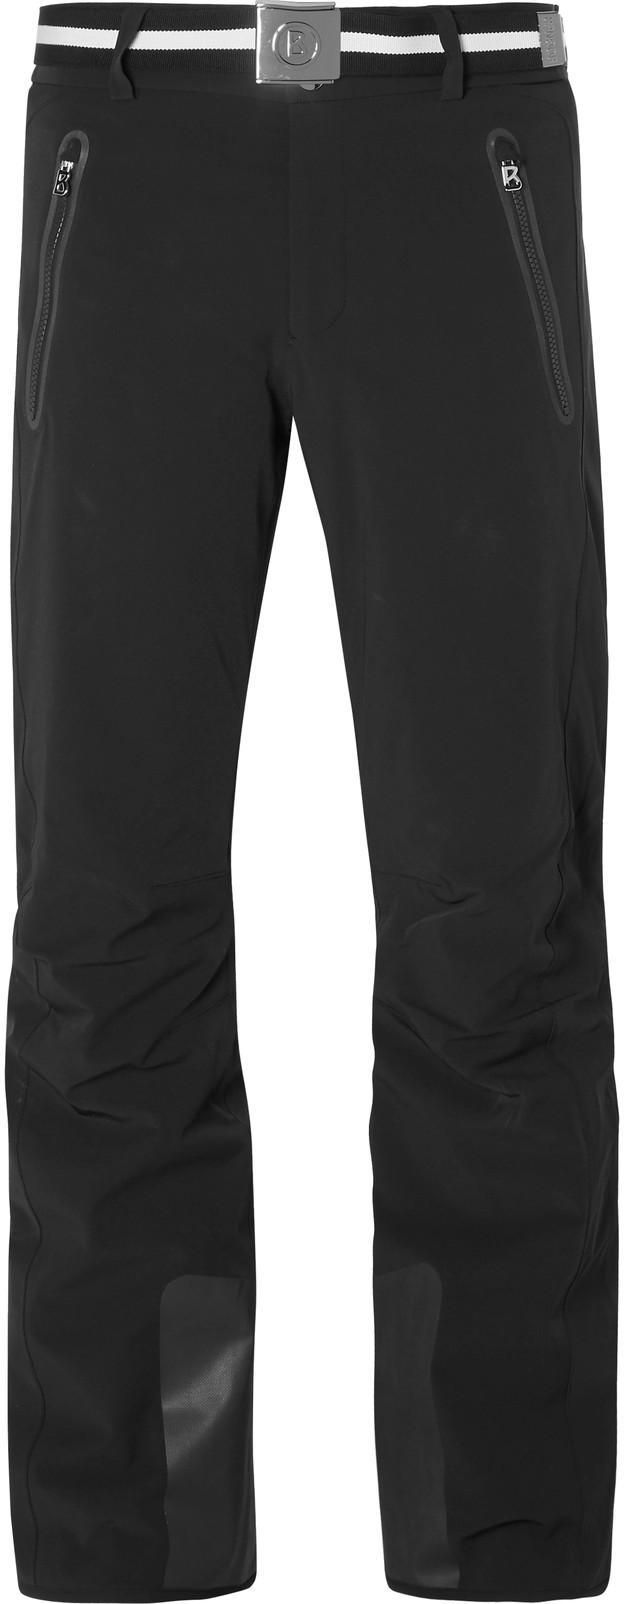 Bogner Tobi-T Ski Trousers at Mr. Porter, $790